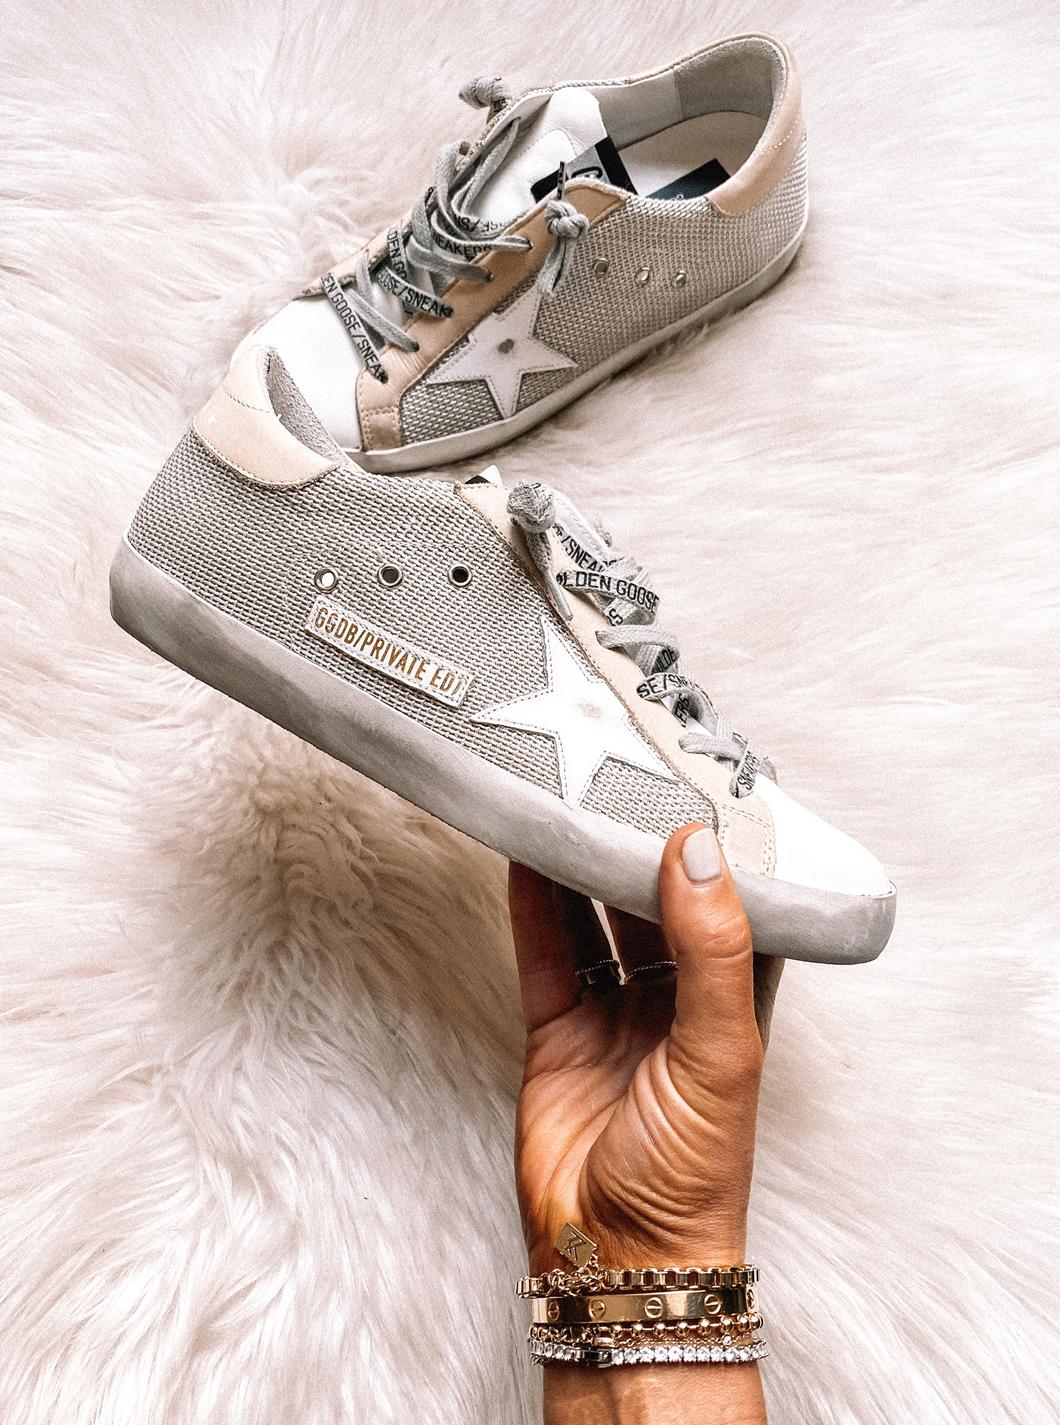 Fashion Jackson Golden Goose Super-Star Private Edition Woven Sneaker